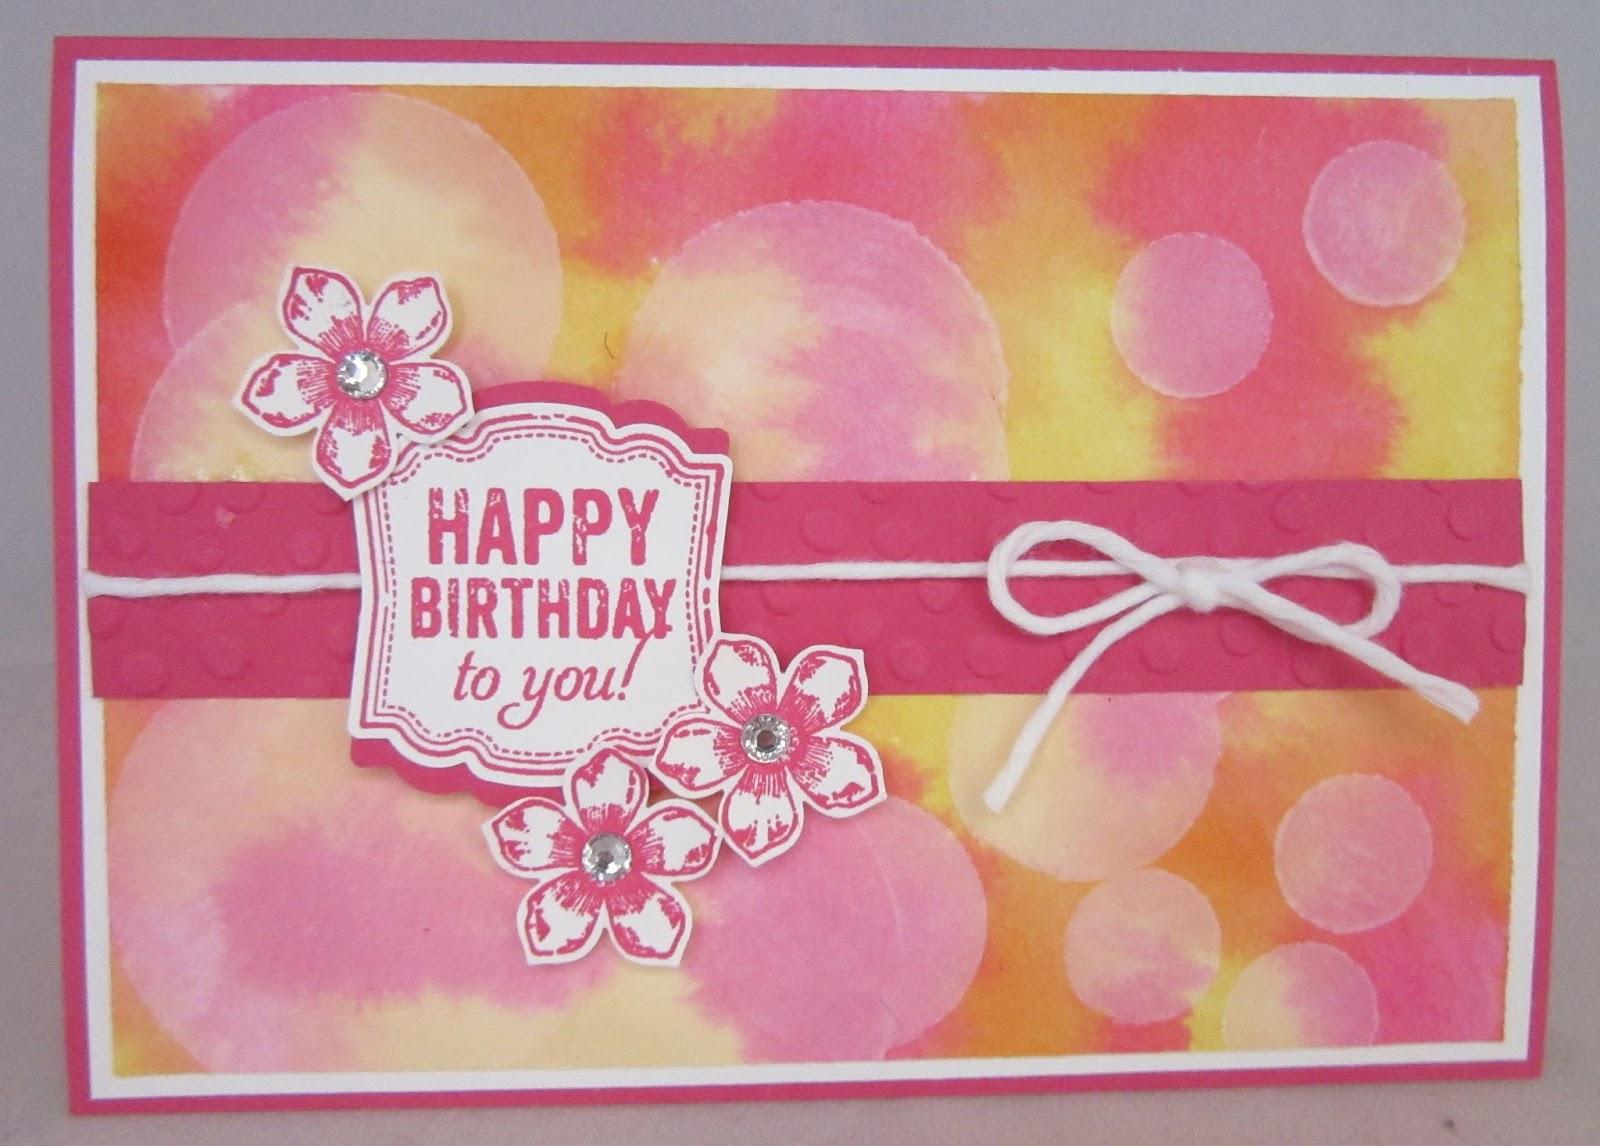 Pink, orange and yellow birthday card